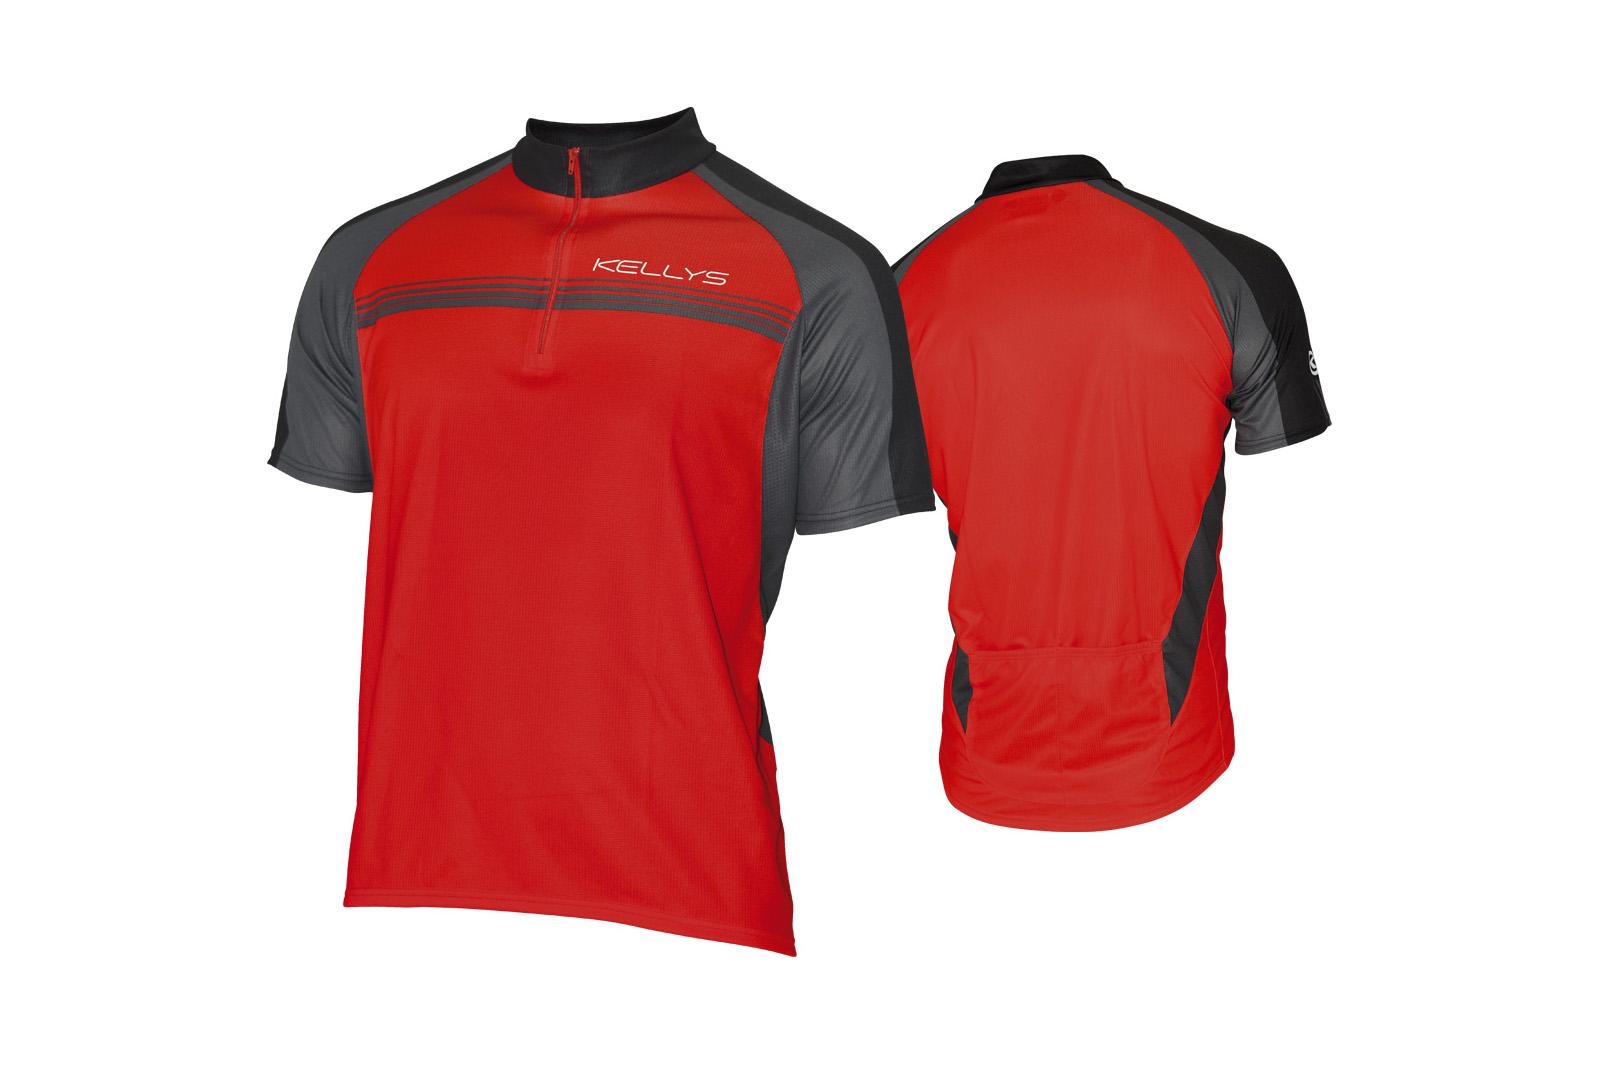 Pánský dres KELLYS PRO Sport, vel. XXL, červená, krátký rukáv (Pánský cyklistický dres KELLYS, vel. XXL, krátký rukáv, barva červená dle vyobrazení!)